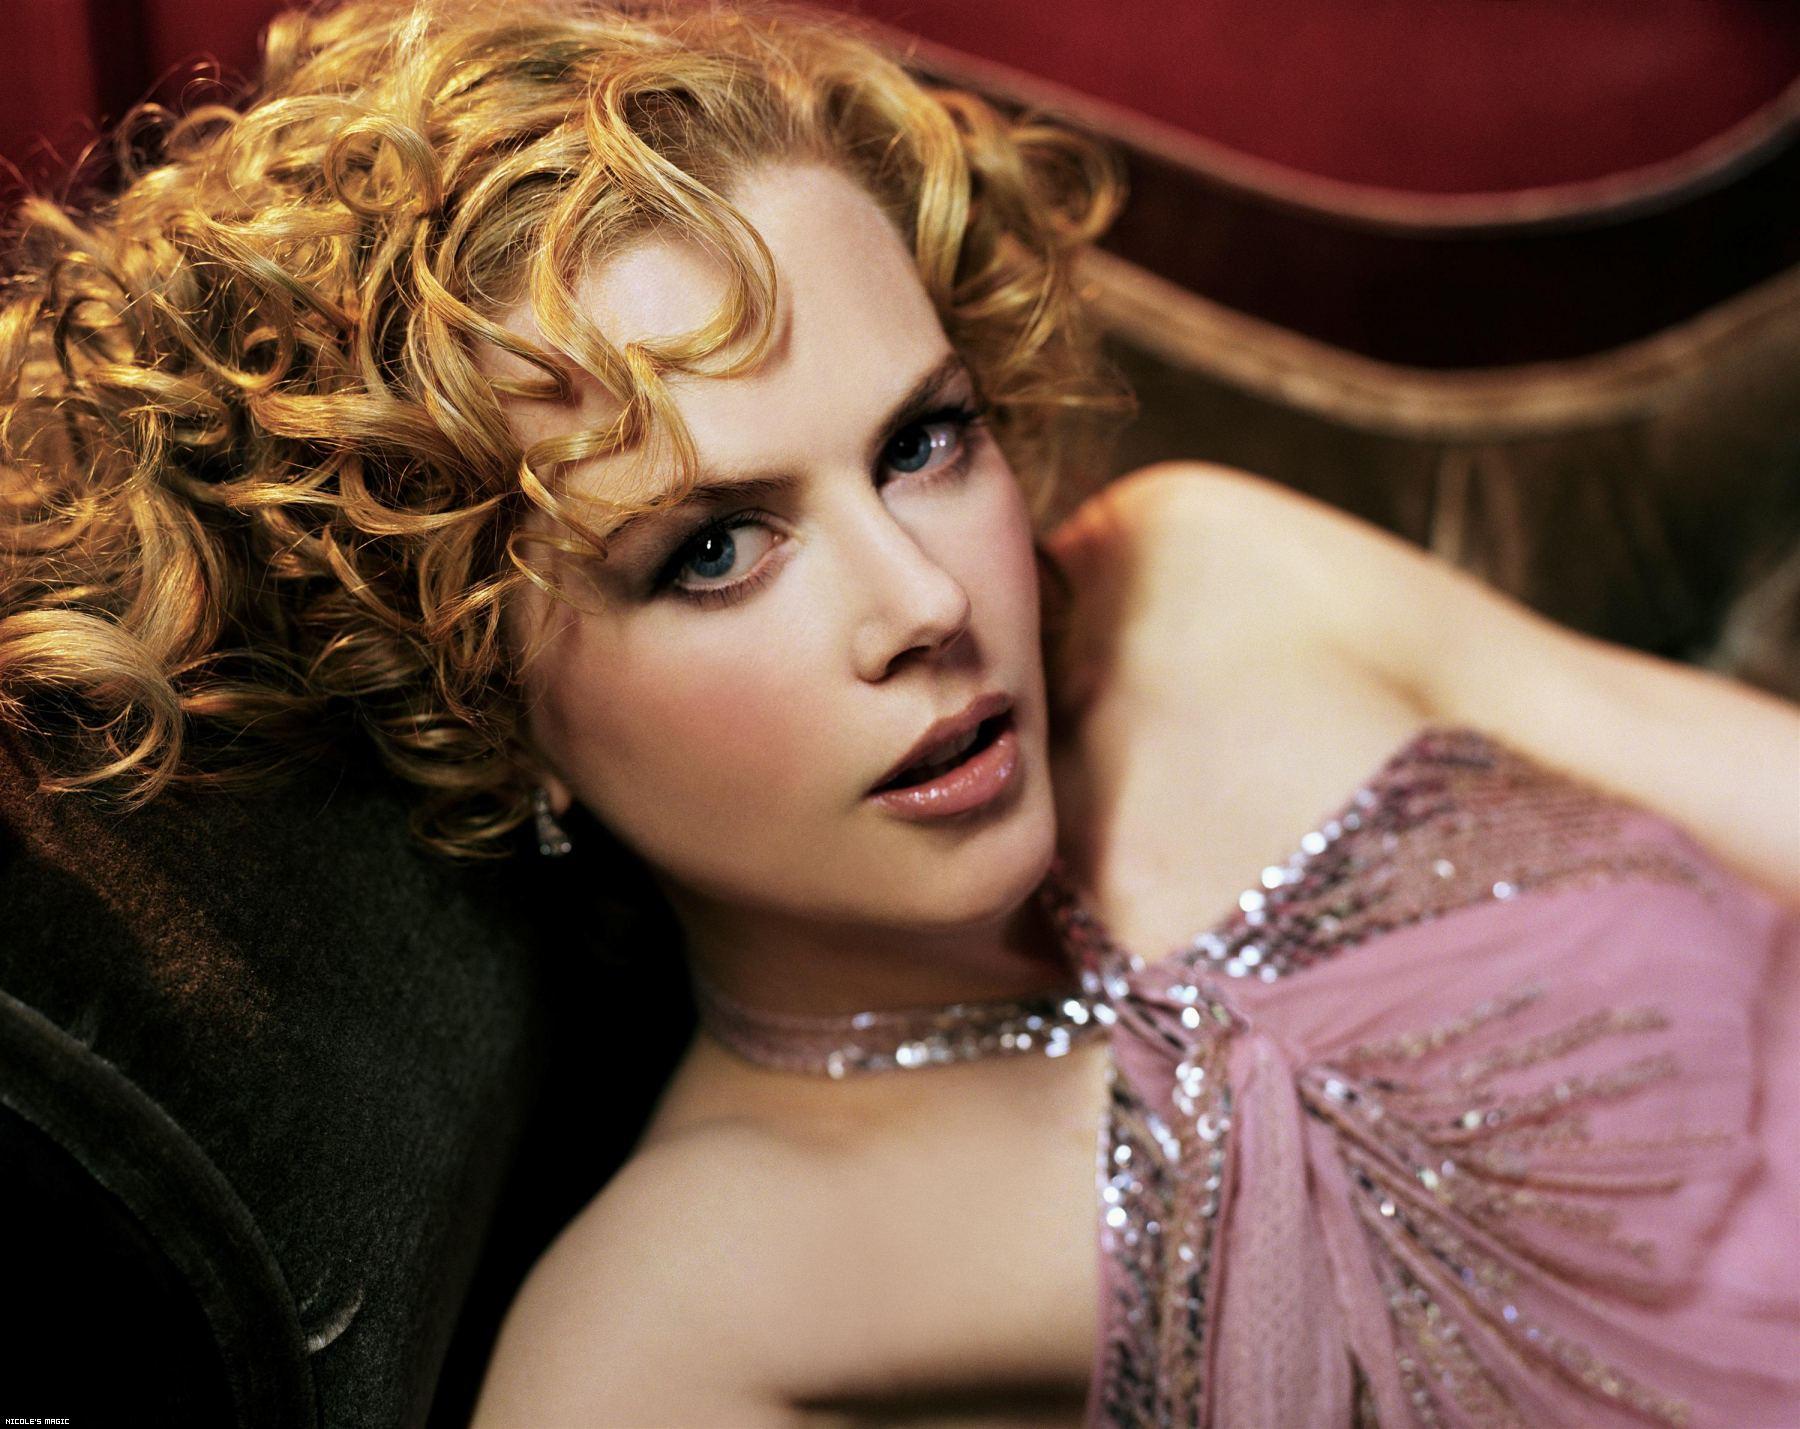 Nicole Kidman - Nicole Kidman Photo (237774) - Fanpop